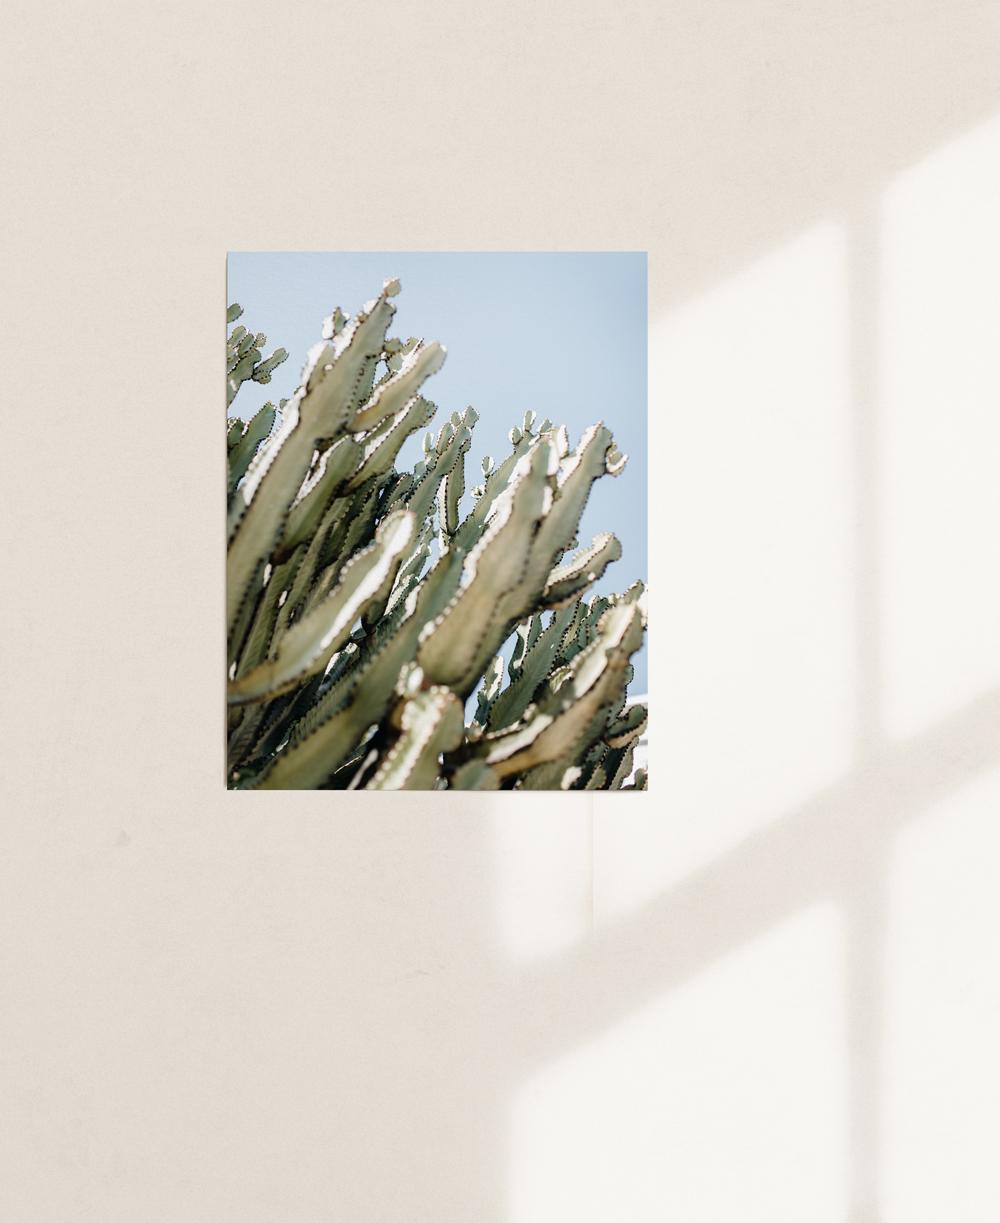 nicischwab-prints-02-012